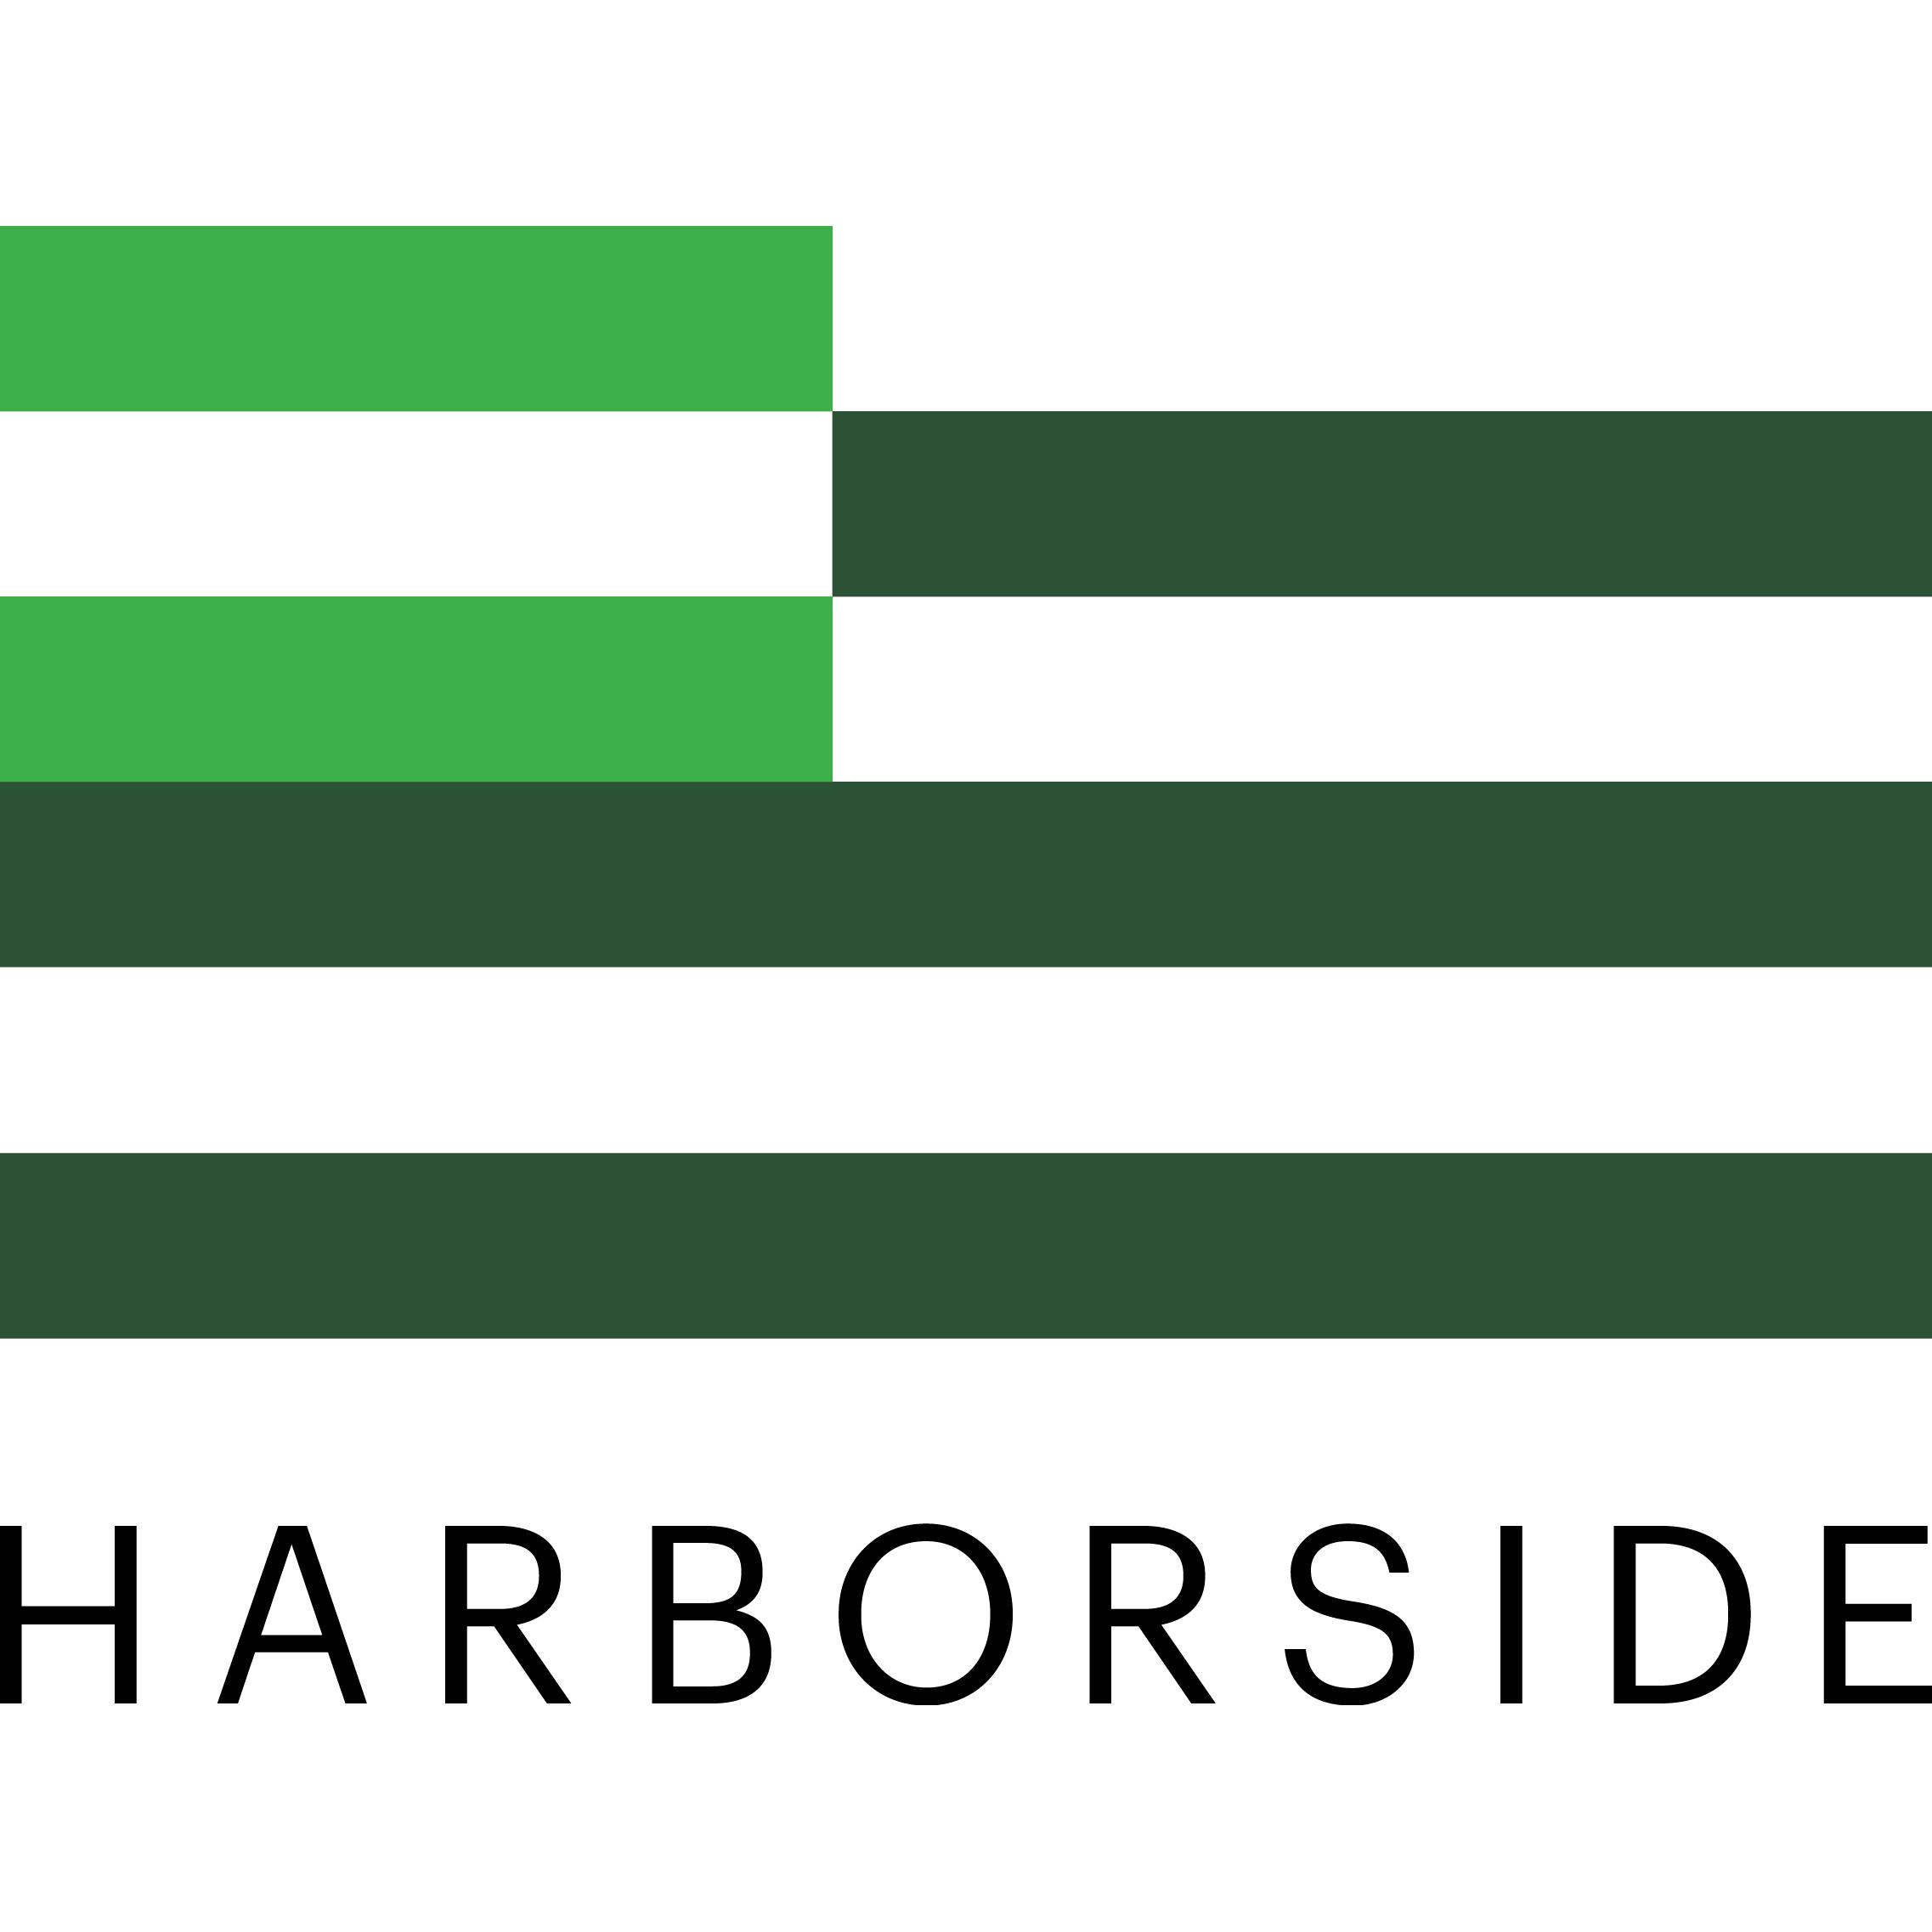 harborside cannabis logo